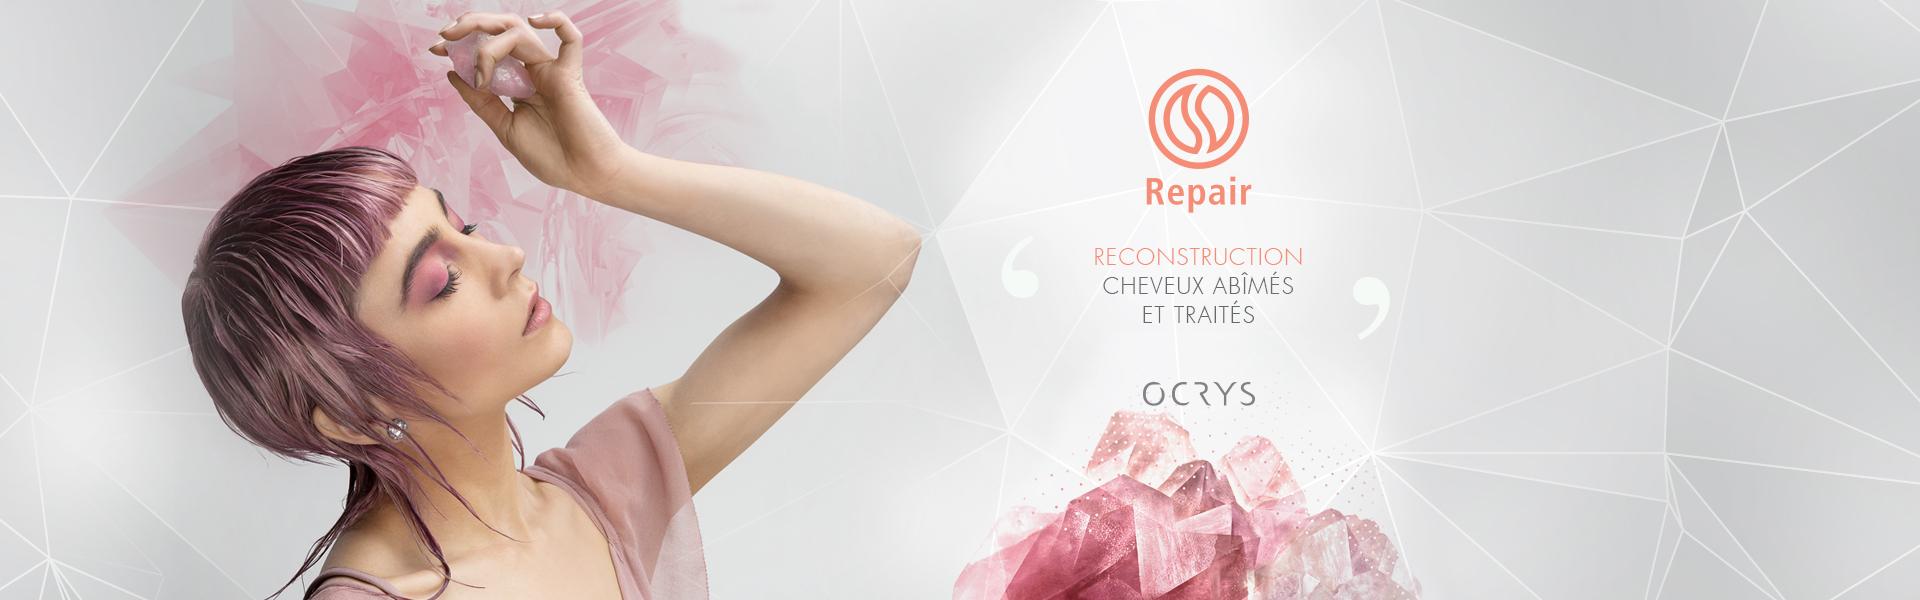 banner_centrali_REPAIR_FR